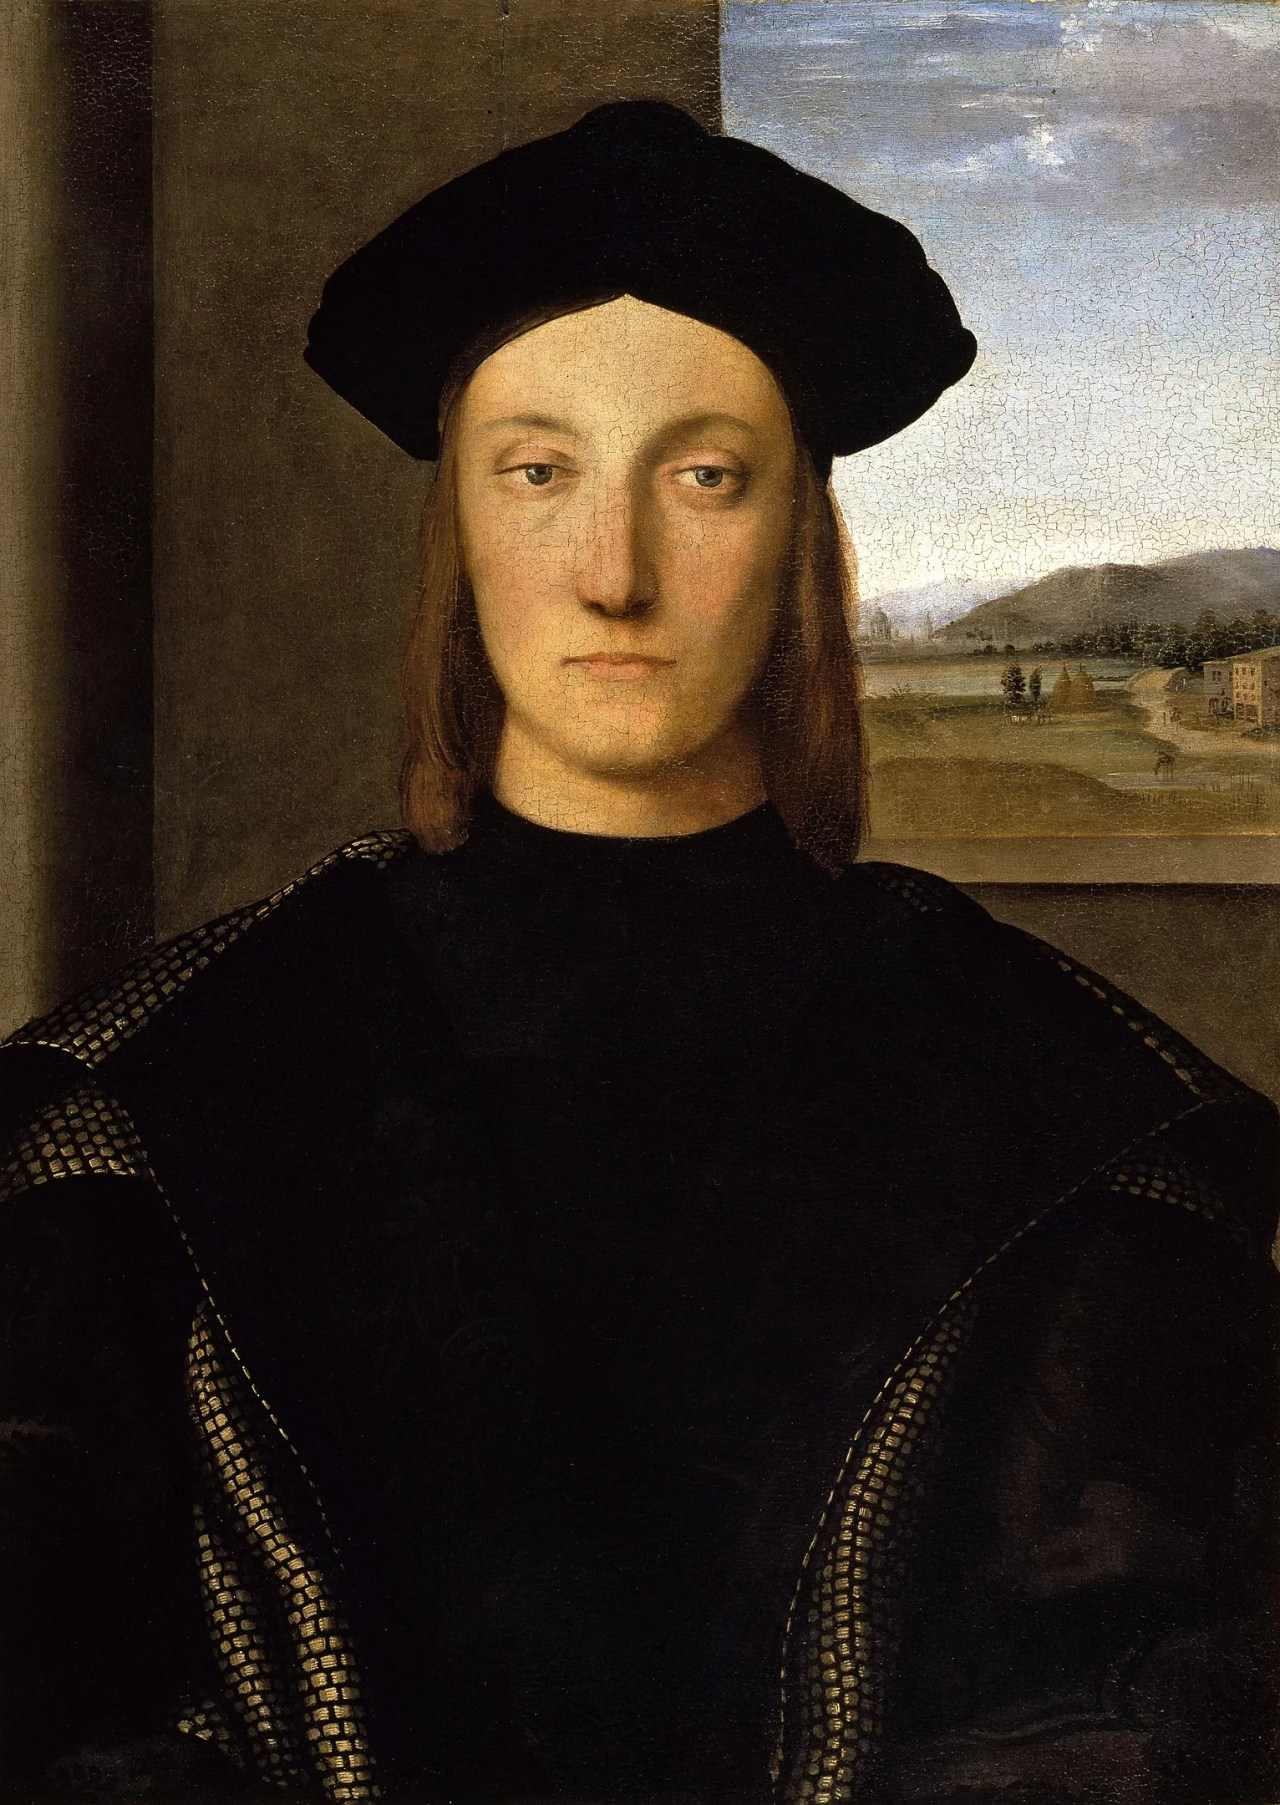 Raffaello Sanzio, Rafael